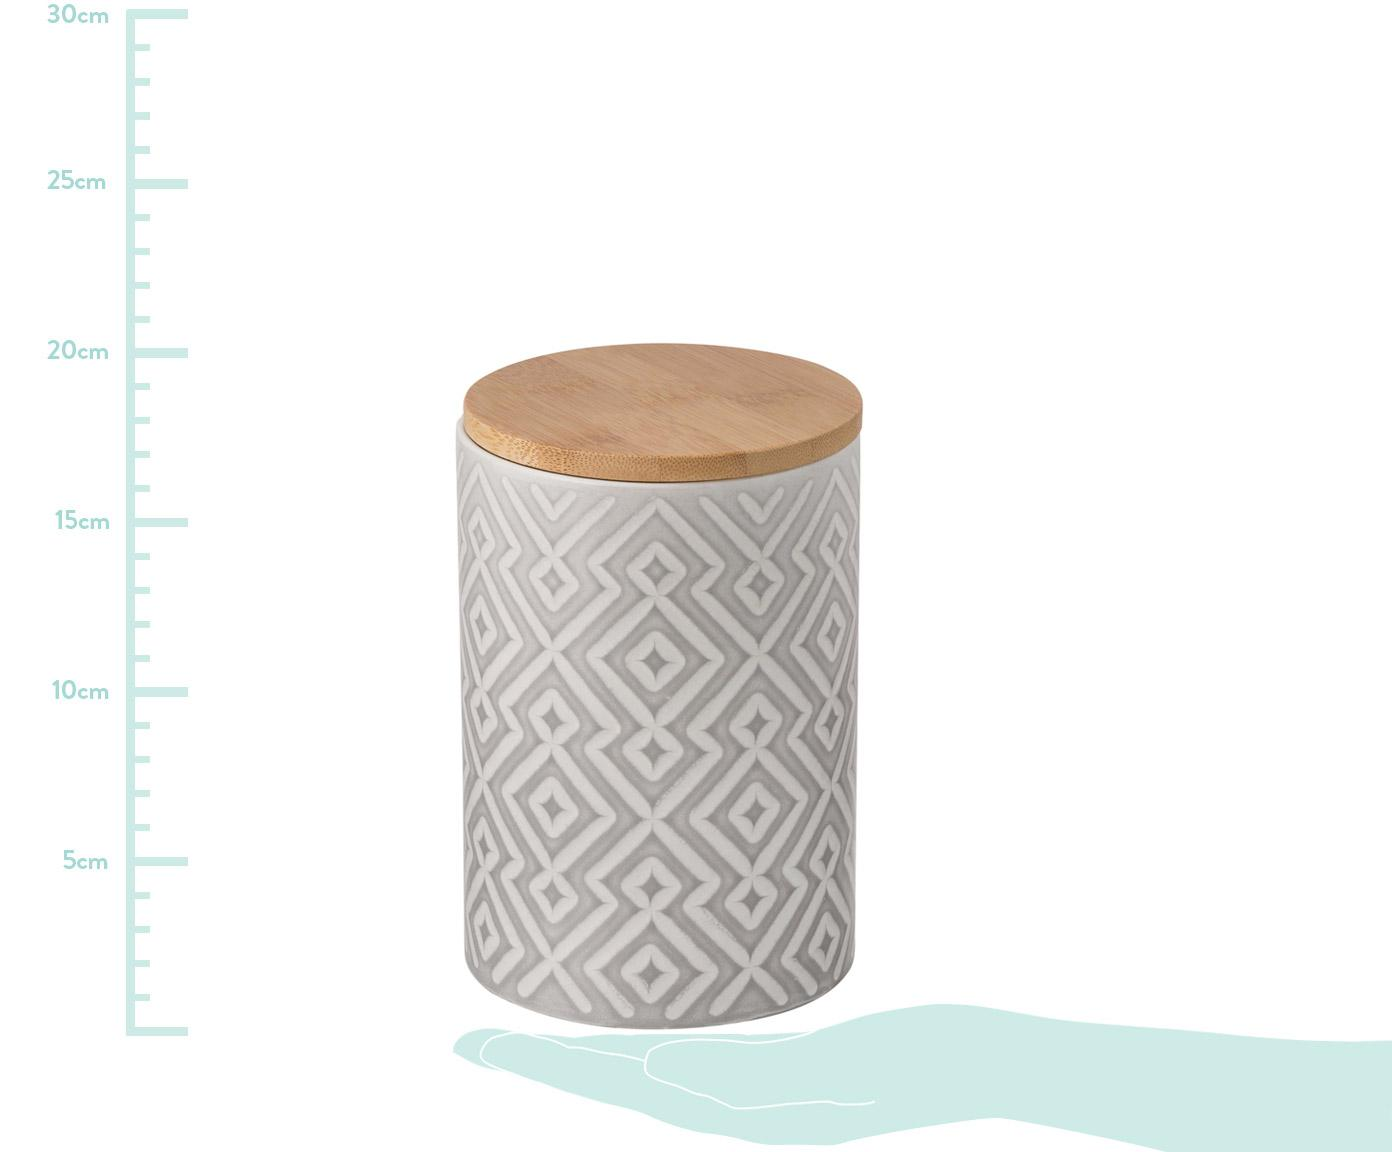 Aufbewahrungsdose Abella, Dose: Keramik, Deckel: Bambus, Dose: Zementgrau, Weiß<br>Deckel: Bambus, Ø 11 x H 17 cm